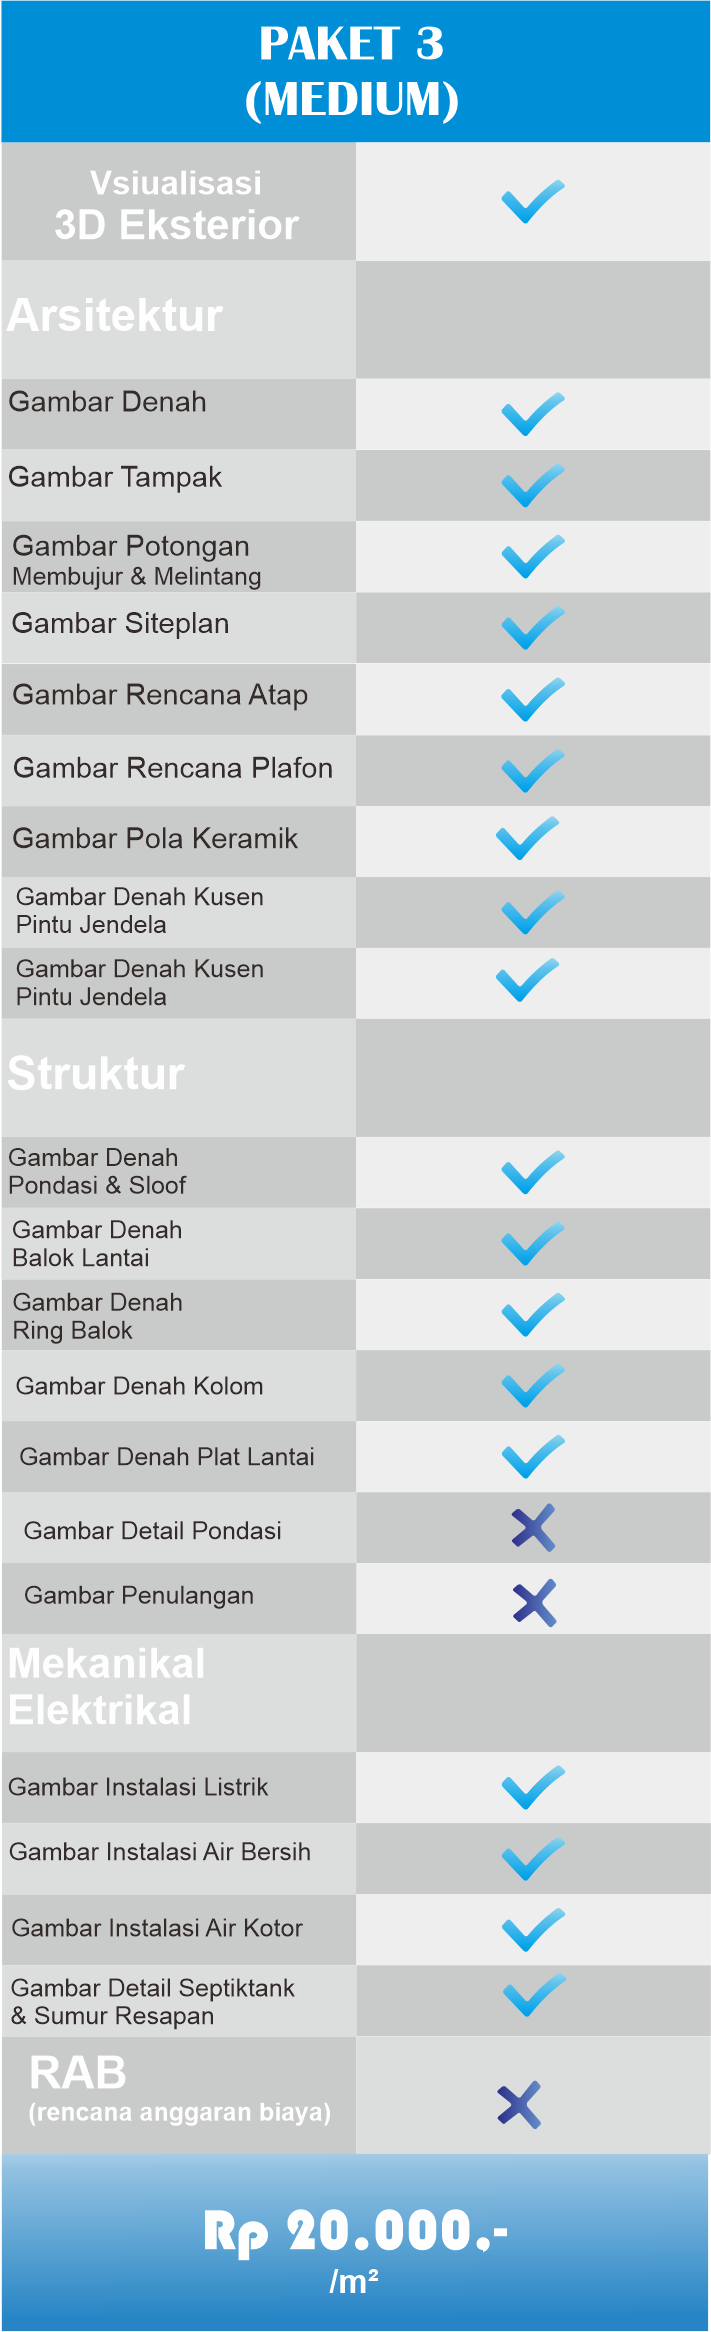 price list 3 - price list 3